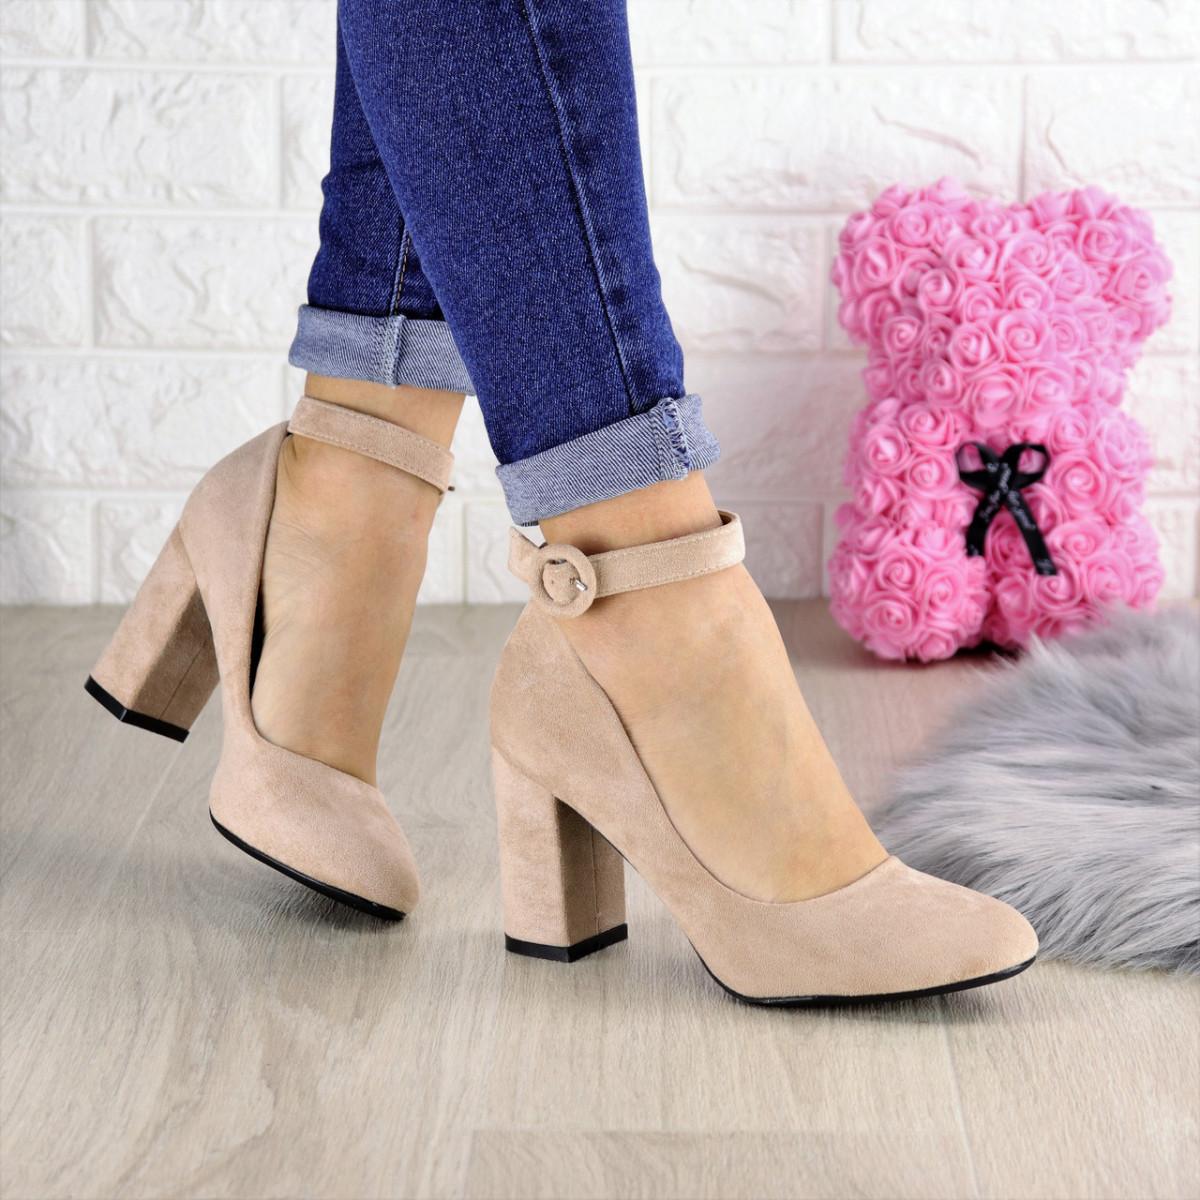 Туфли женские на каблуке бежевые Bruno 1425